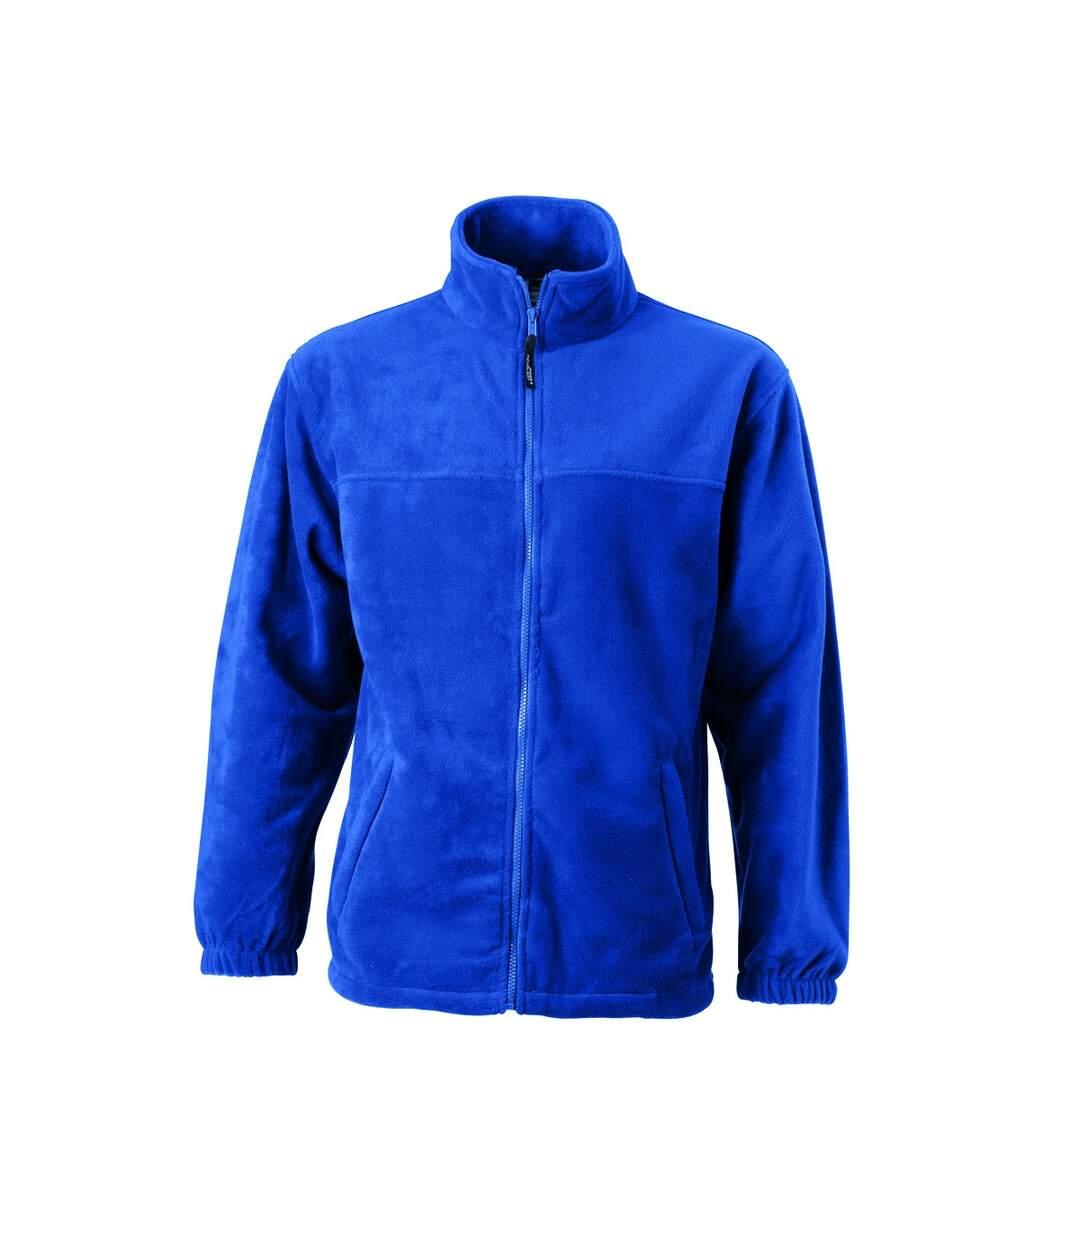 Veste polaire zippée homme - JN044 - bleu roi